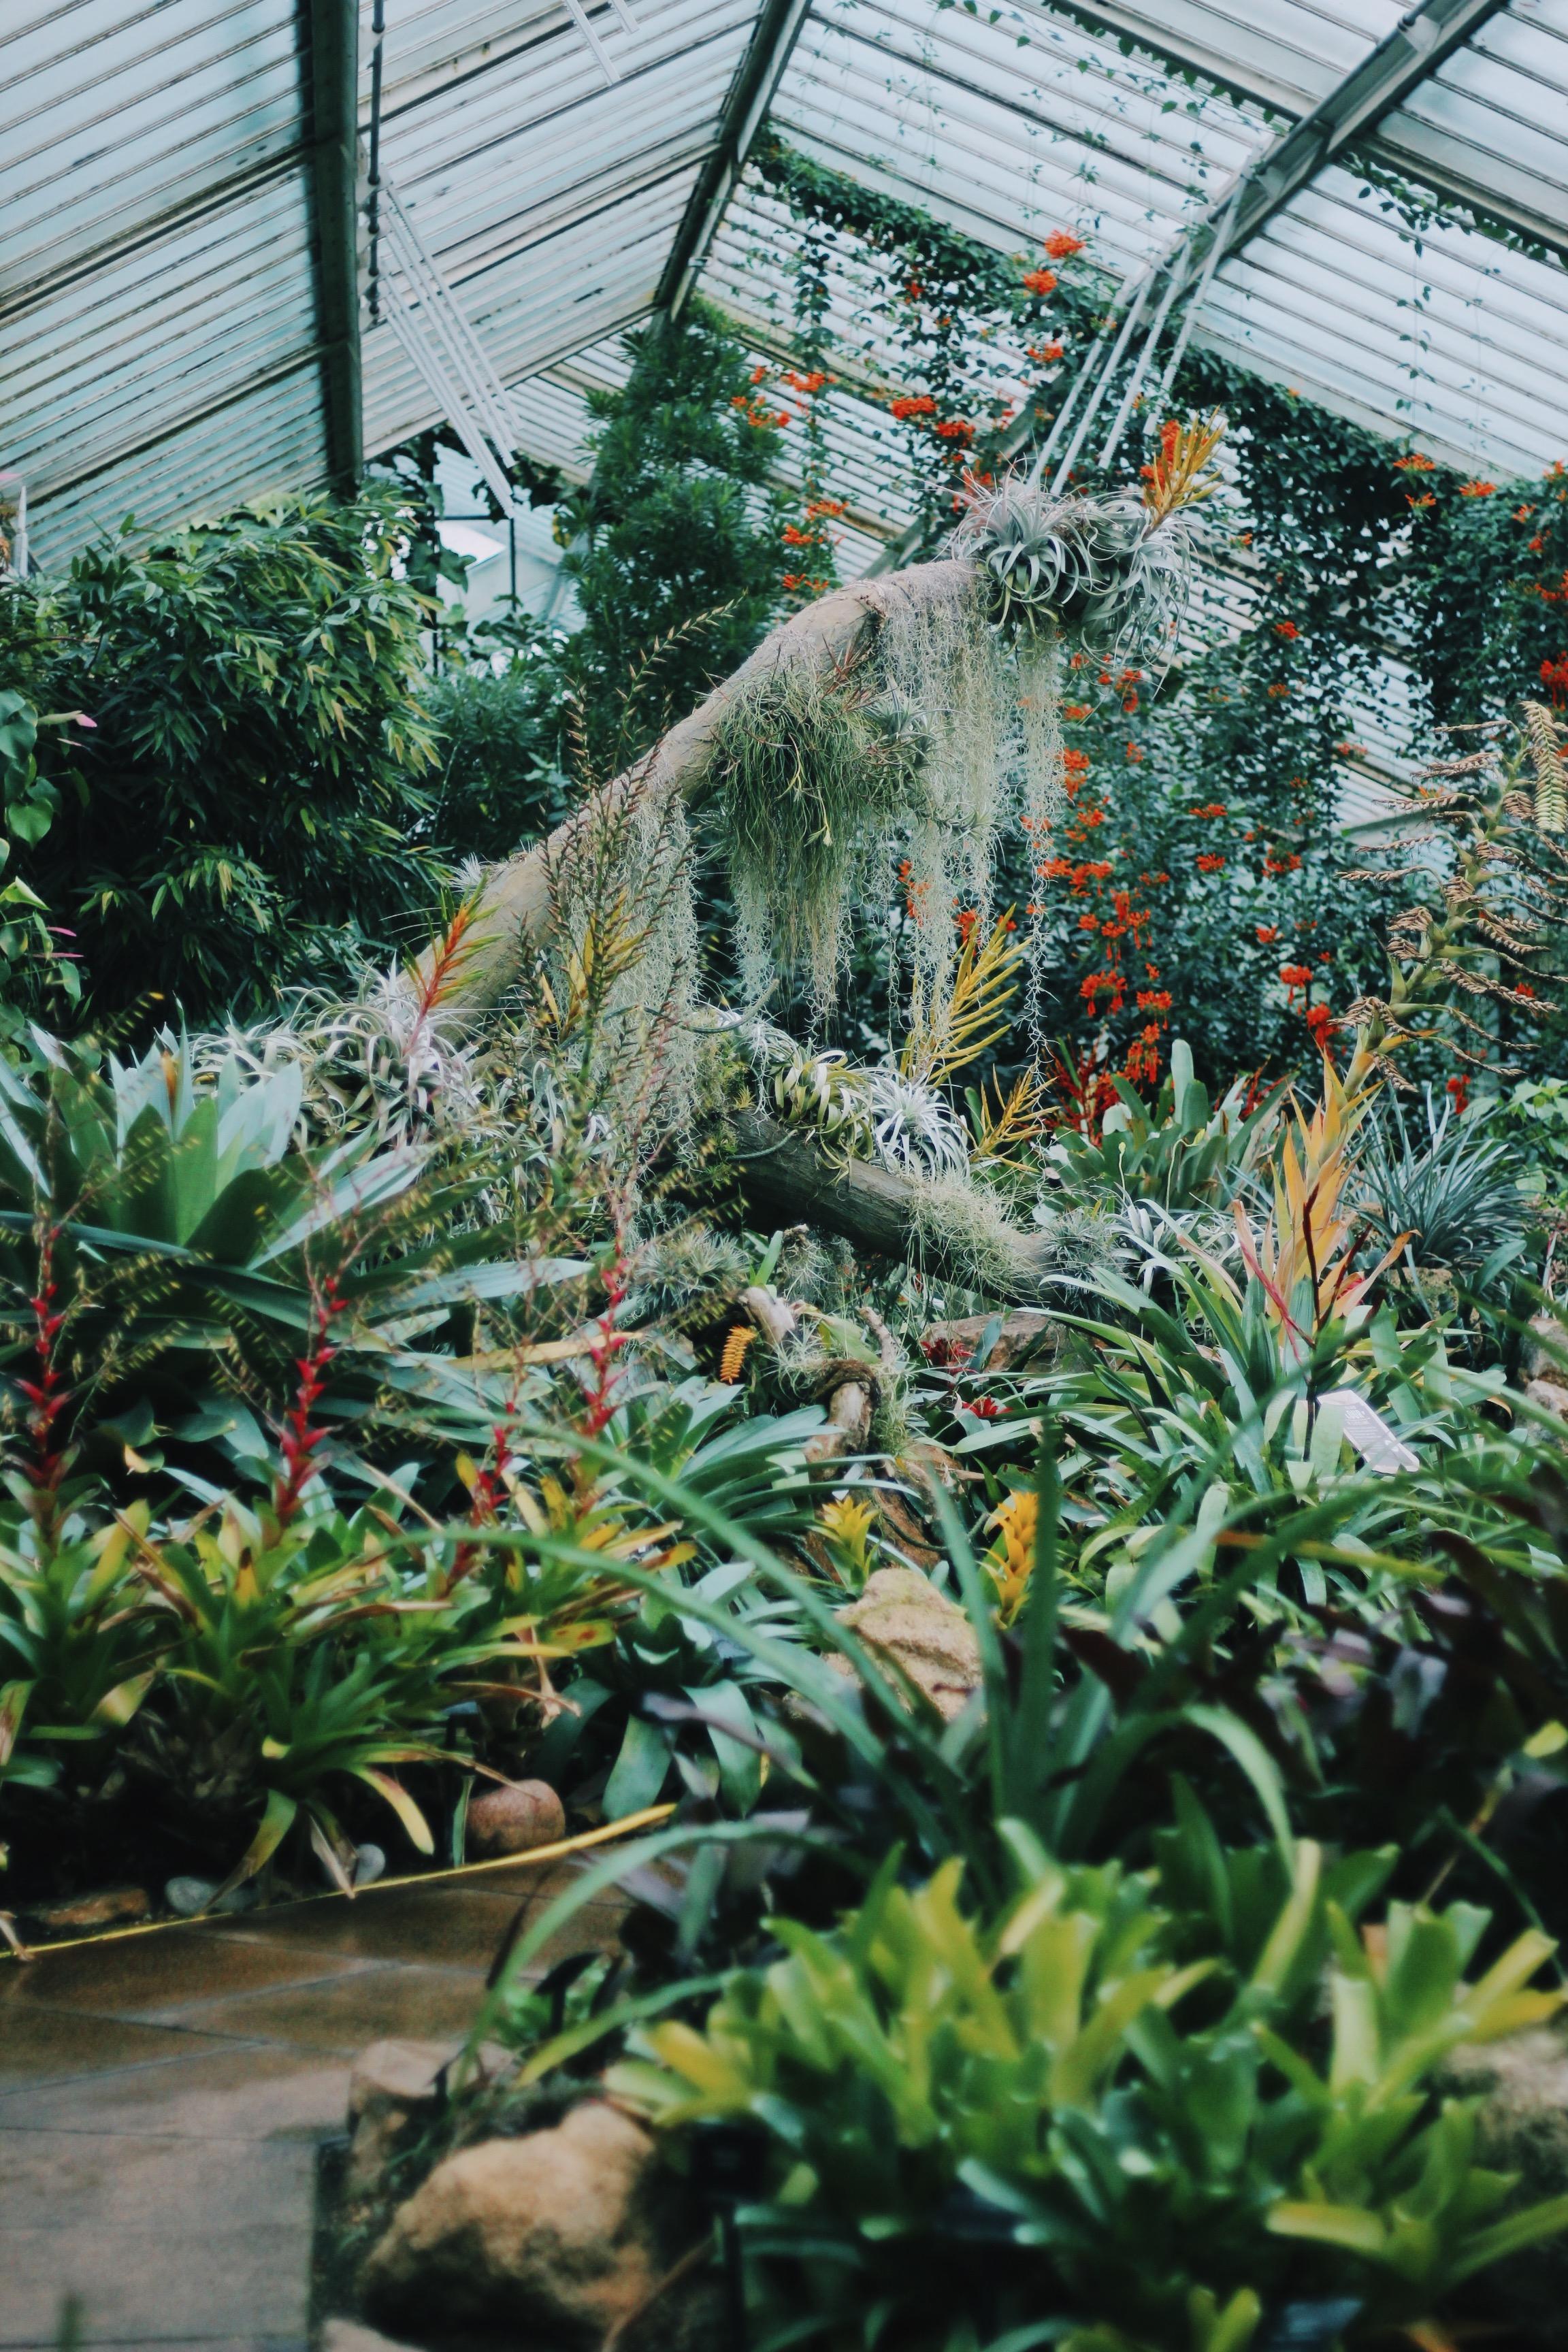 My Favorite Temperature Zone. Tropical Rainforest :)